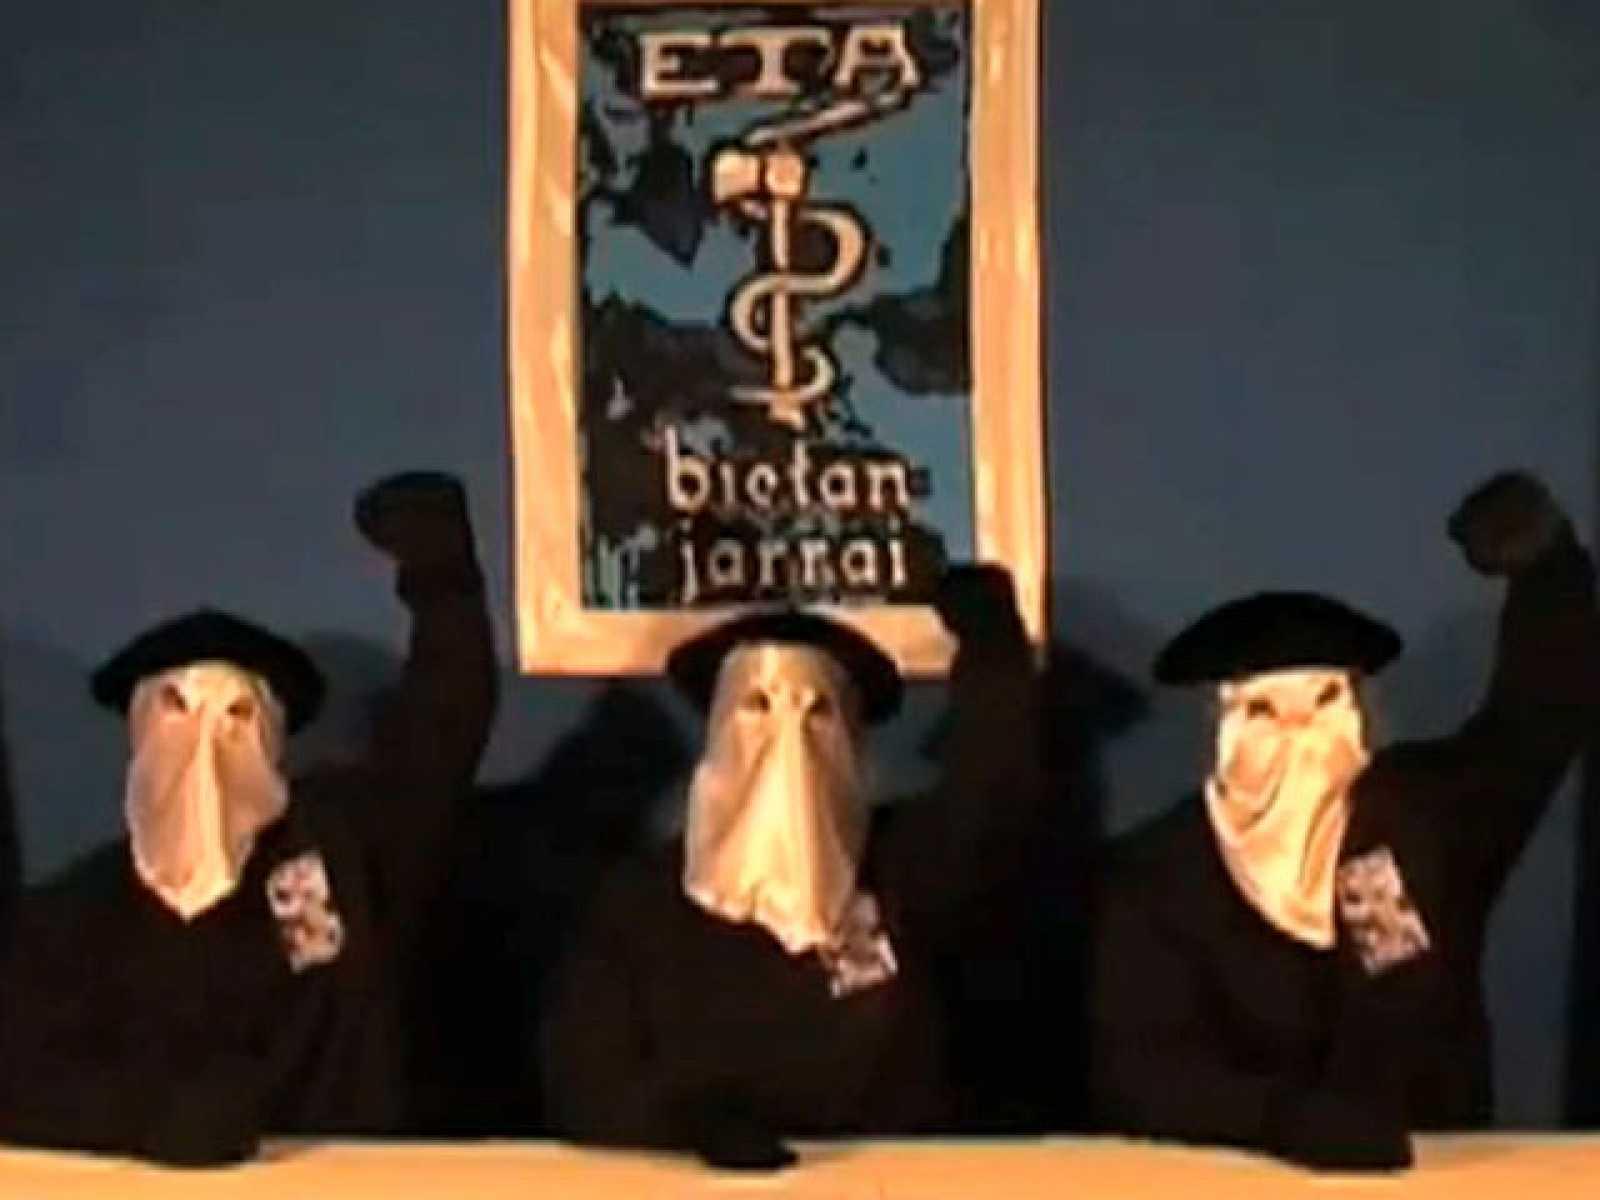 Las treguas anunciadas por la banda terrorista ETA